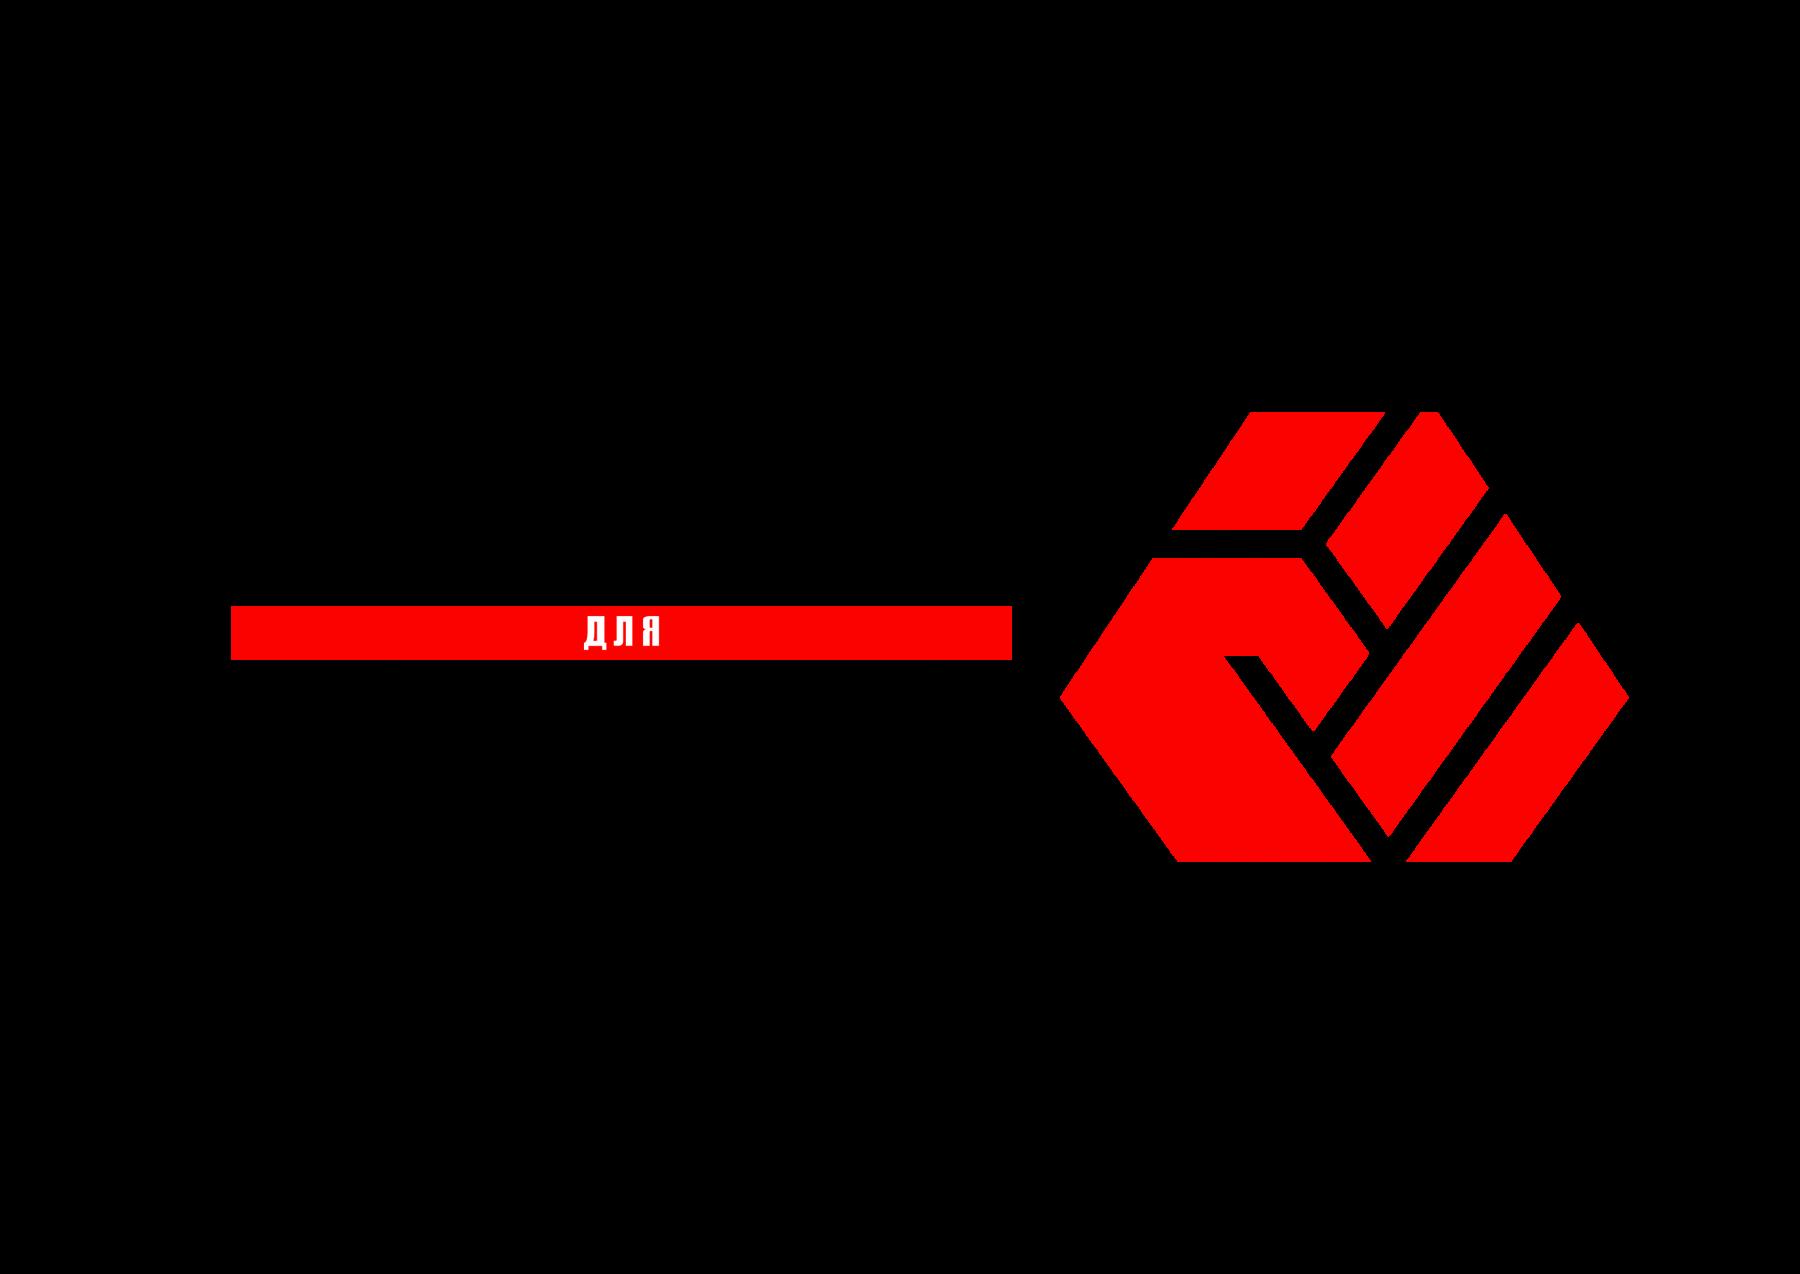 stranafund-logo